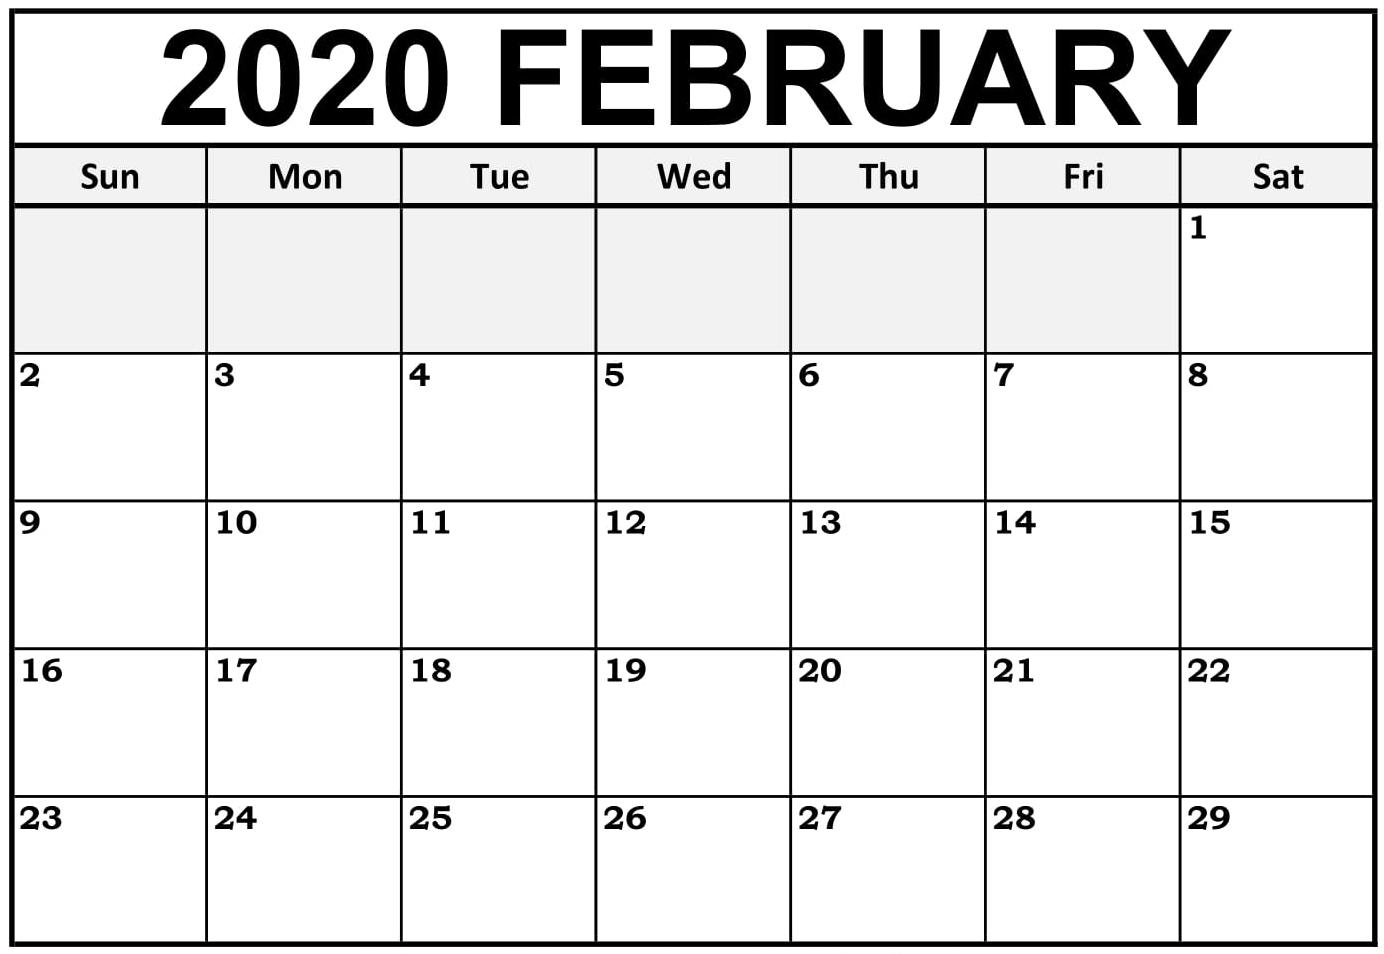 Printable February Calendar For 2020 – Waterproof Paper | 12